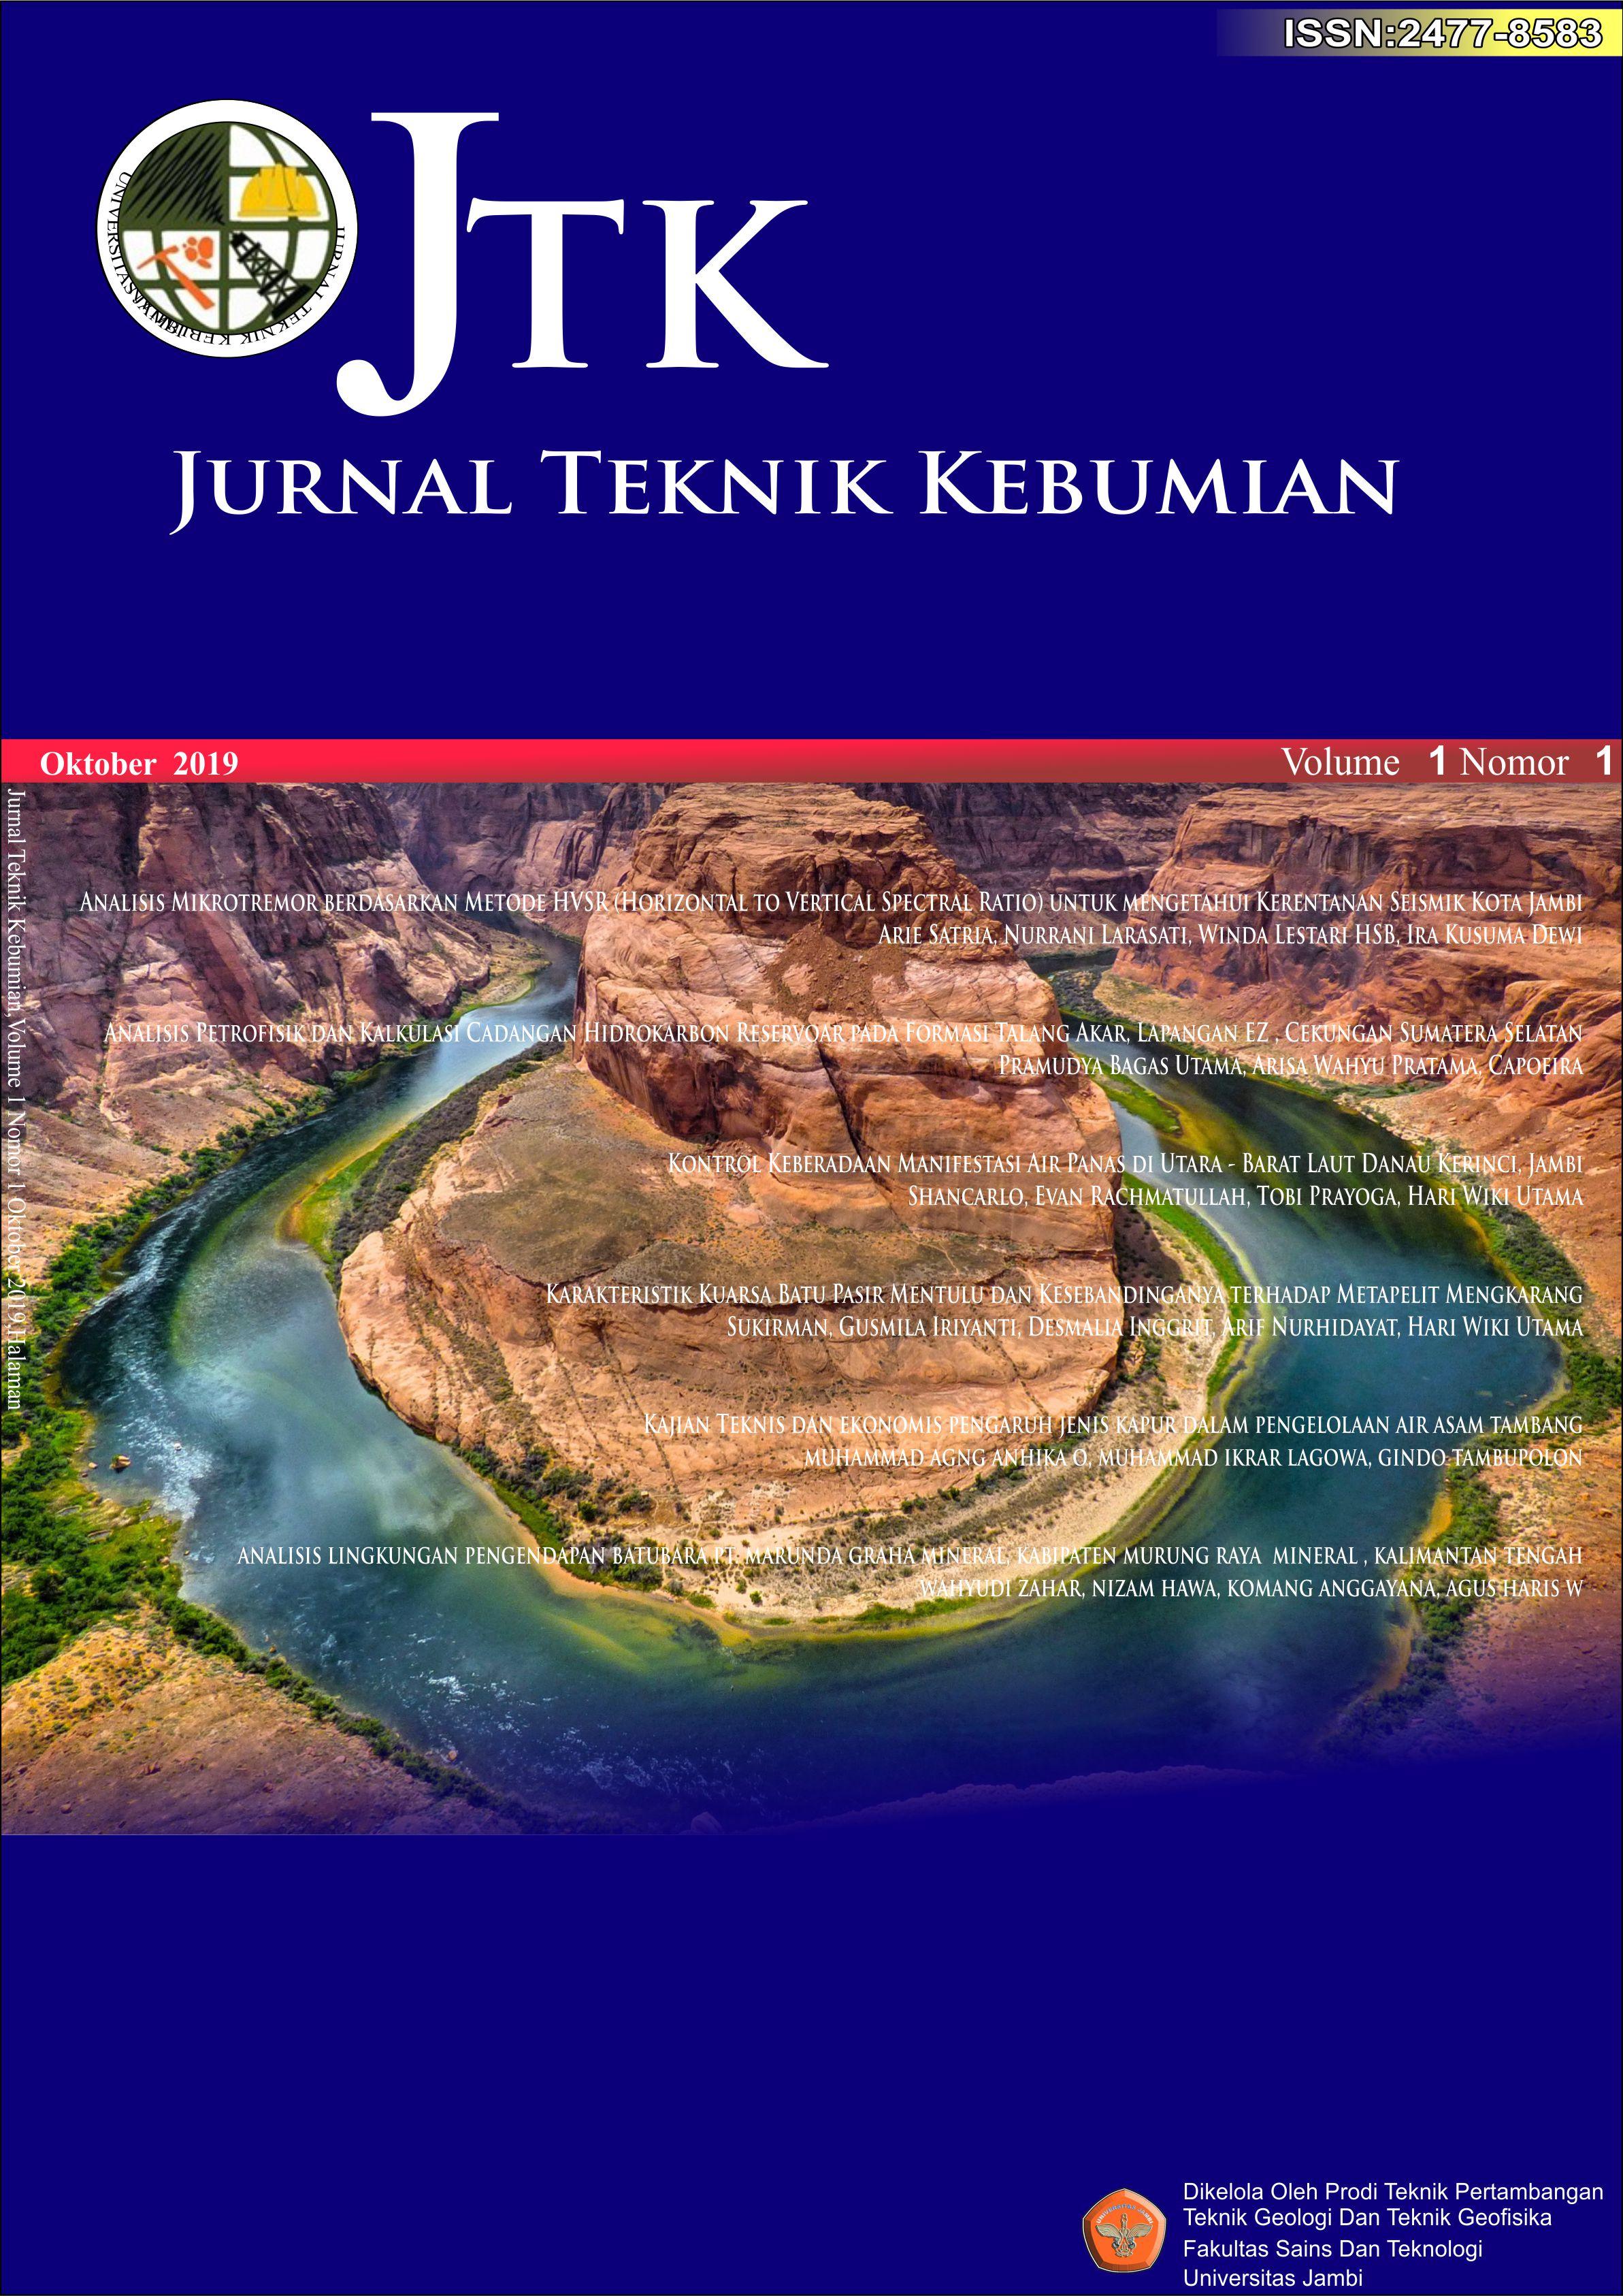 View Vol. 5 No. 2 (2020): Vol 5 No 2 (2020) JURNAL TEKNIK KEBUMIAN